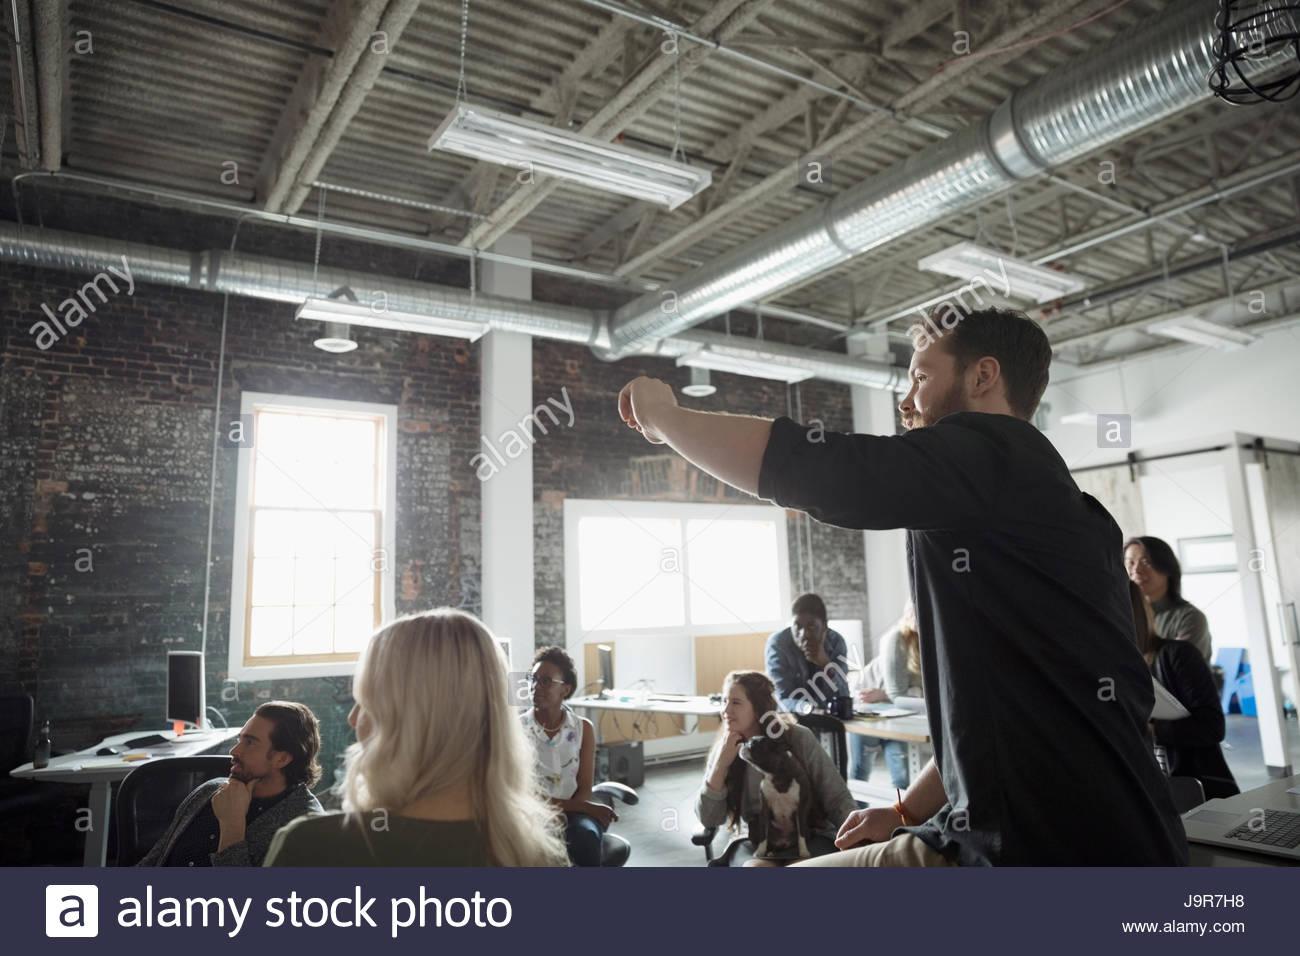 Creative businessman leading meeting in open plan loft office - Stock Image